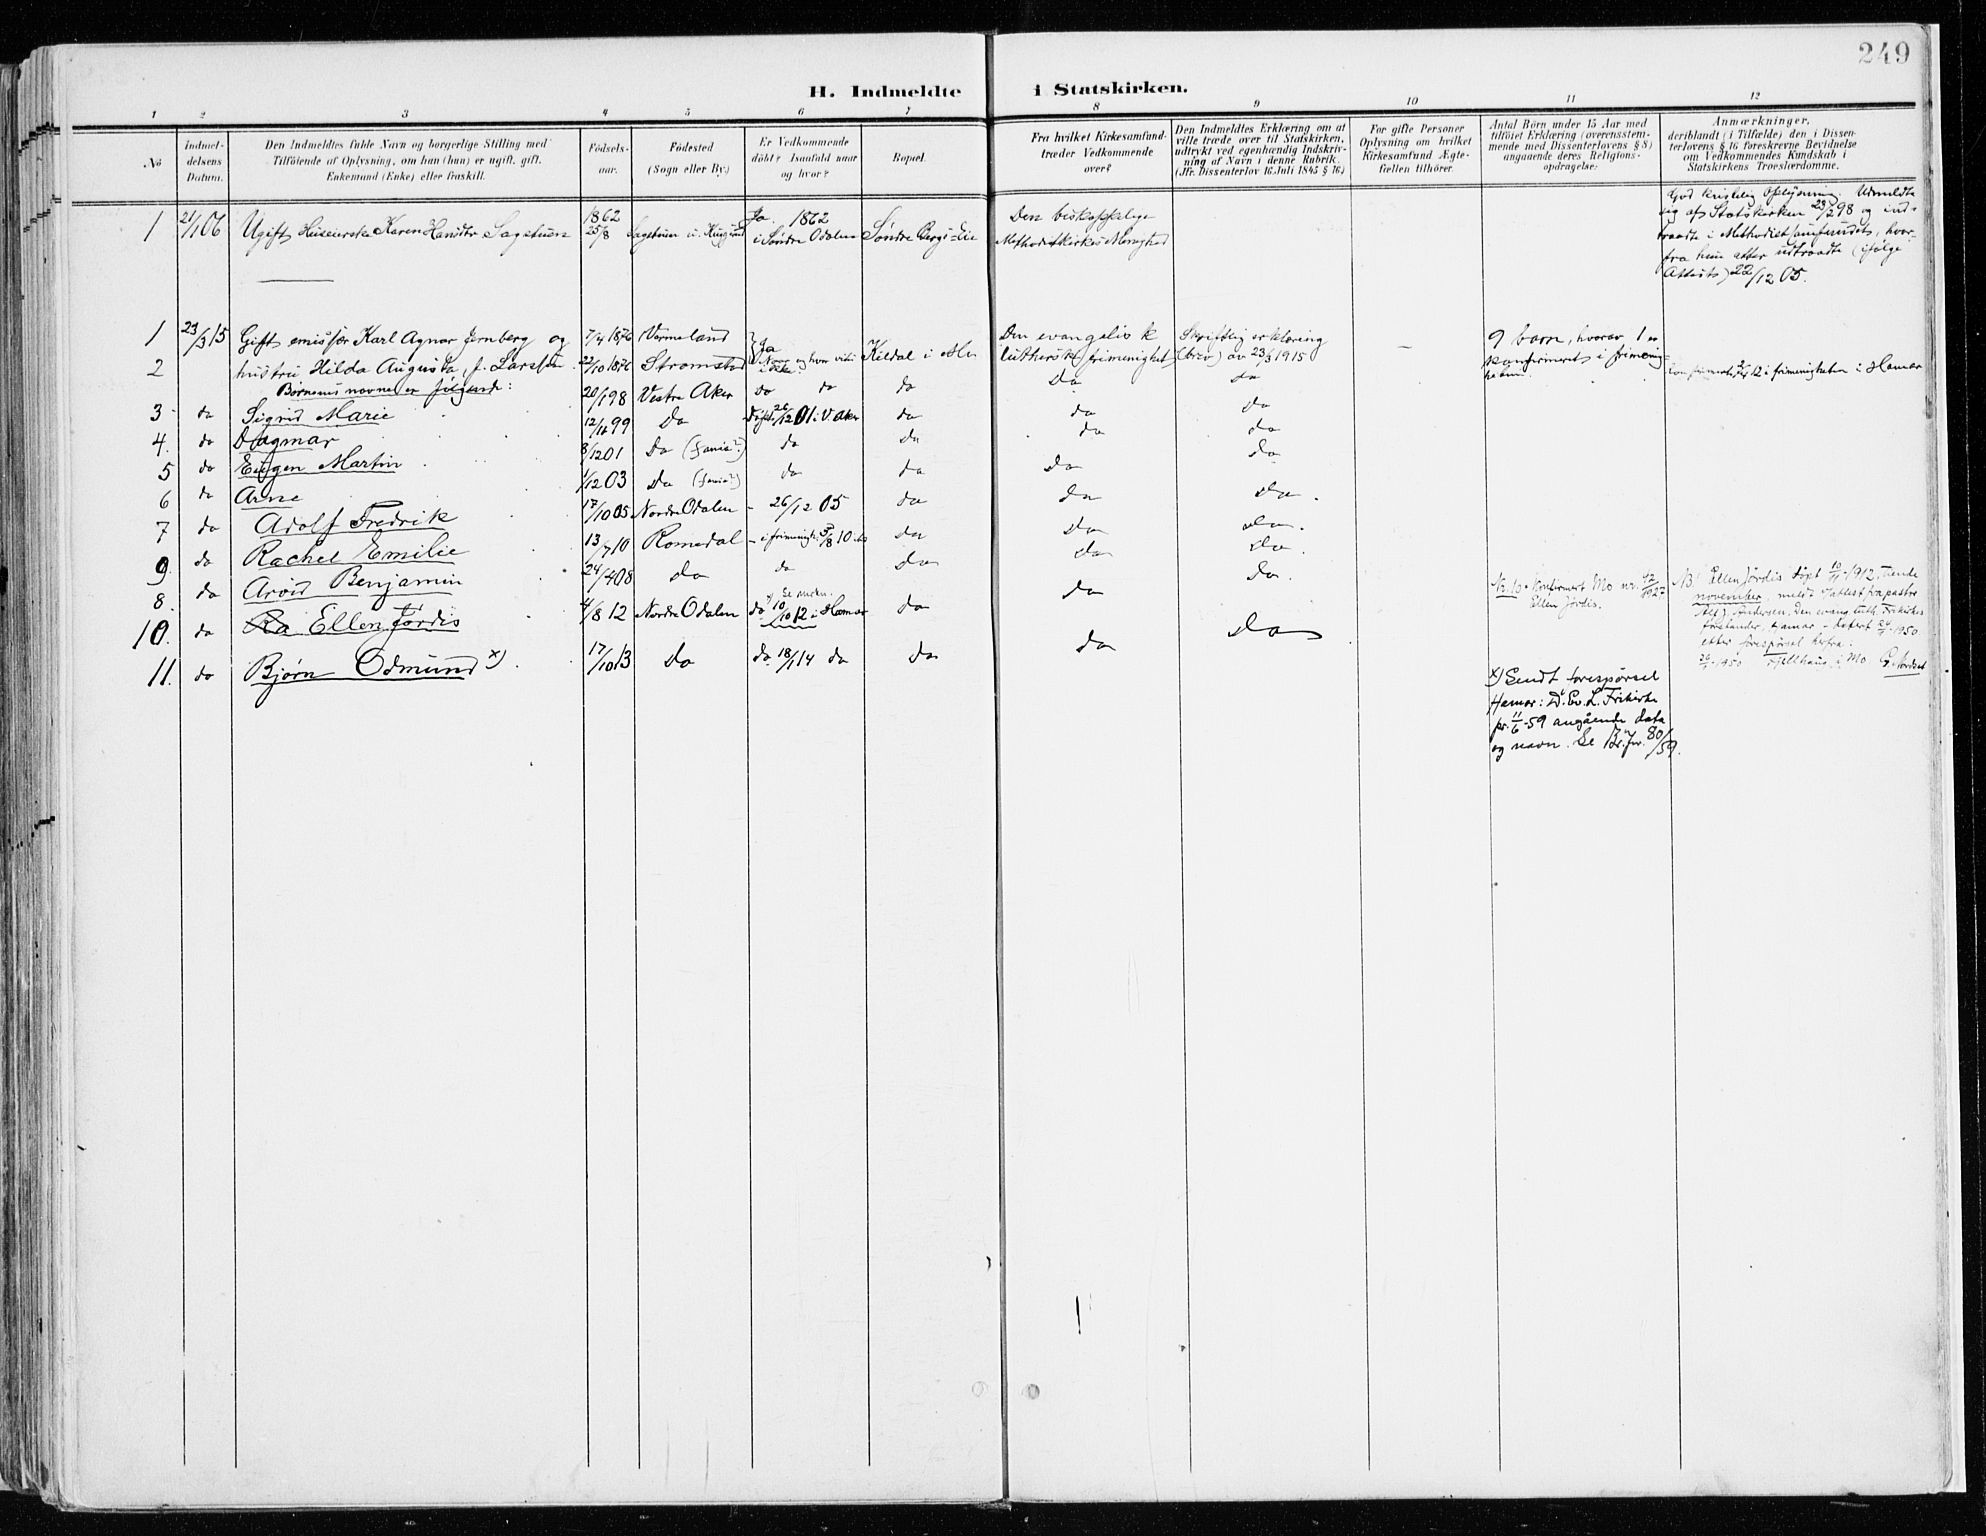 SAH, Nord-Odal prestekontor, Ministerialbok nr. 9, 1902-1926, s. 249